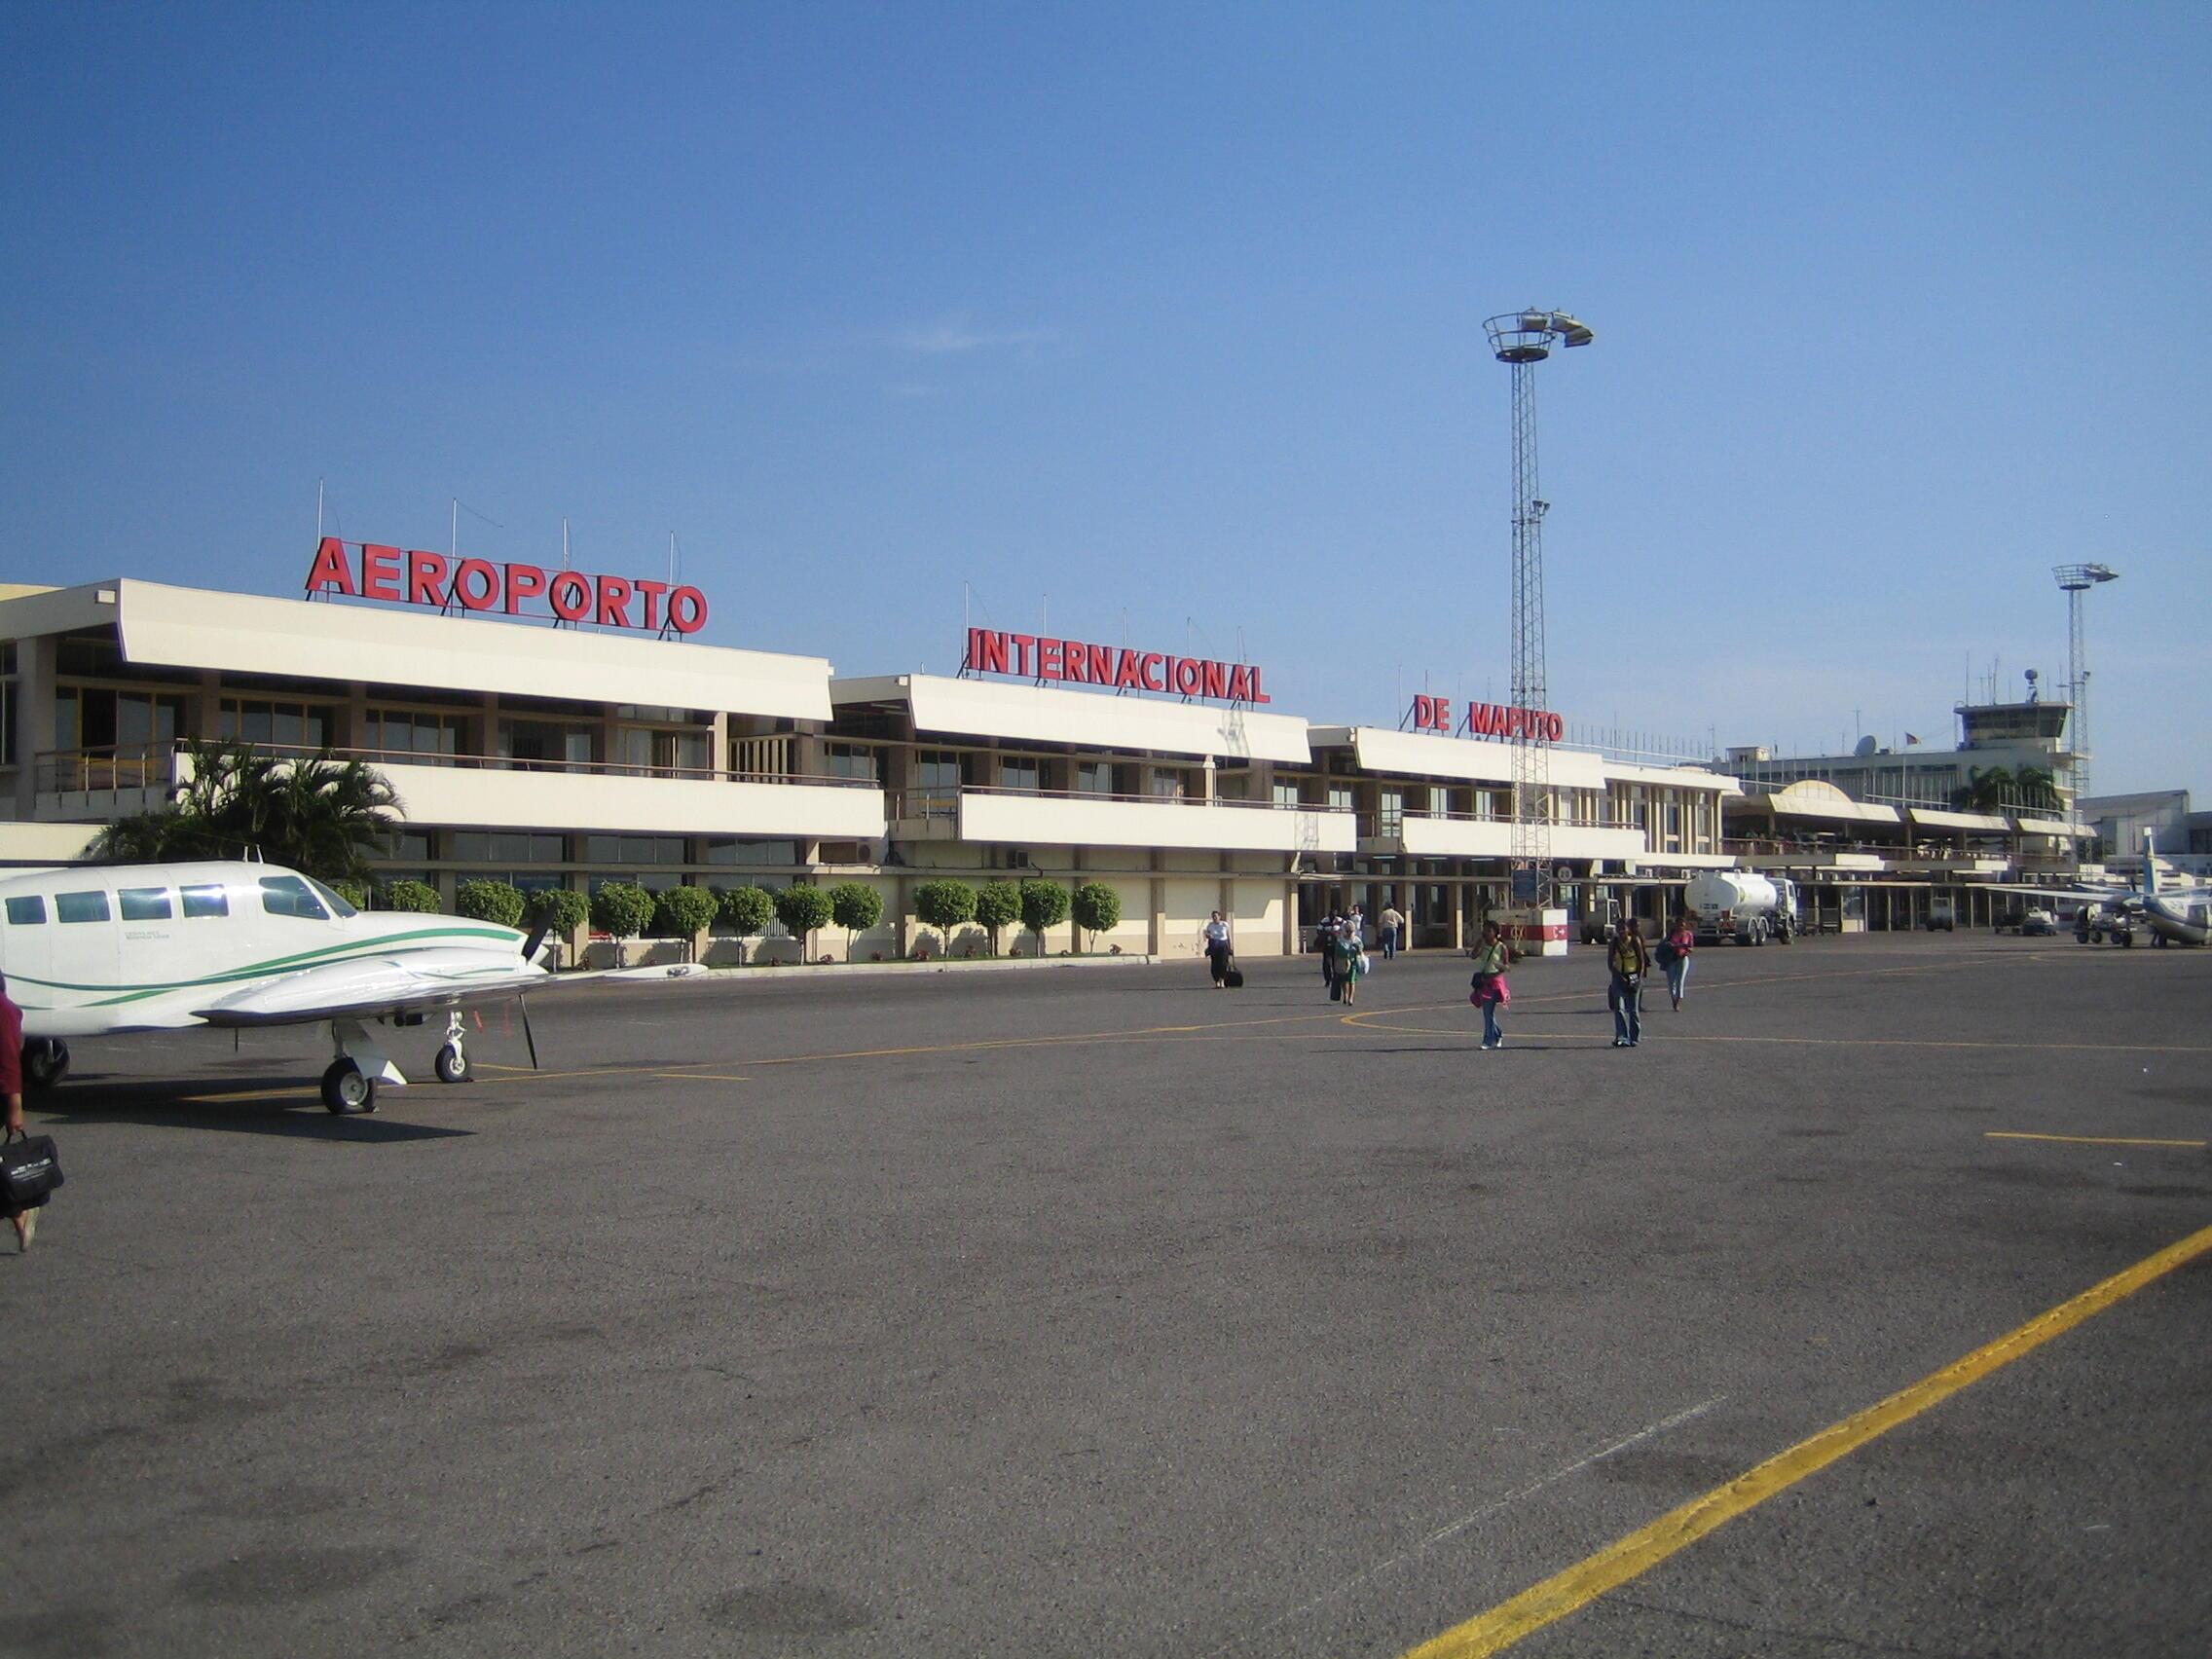 Aeroporto Internacional de Maputo, Moçambique